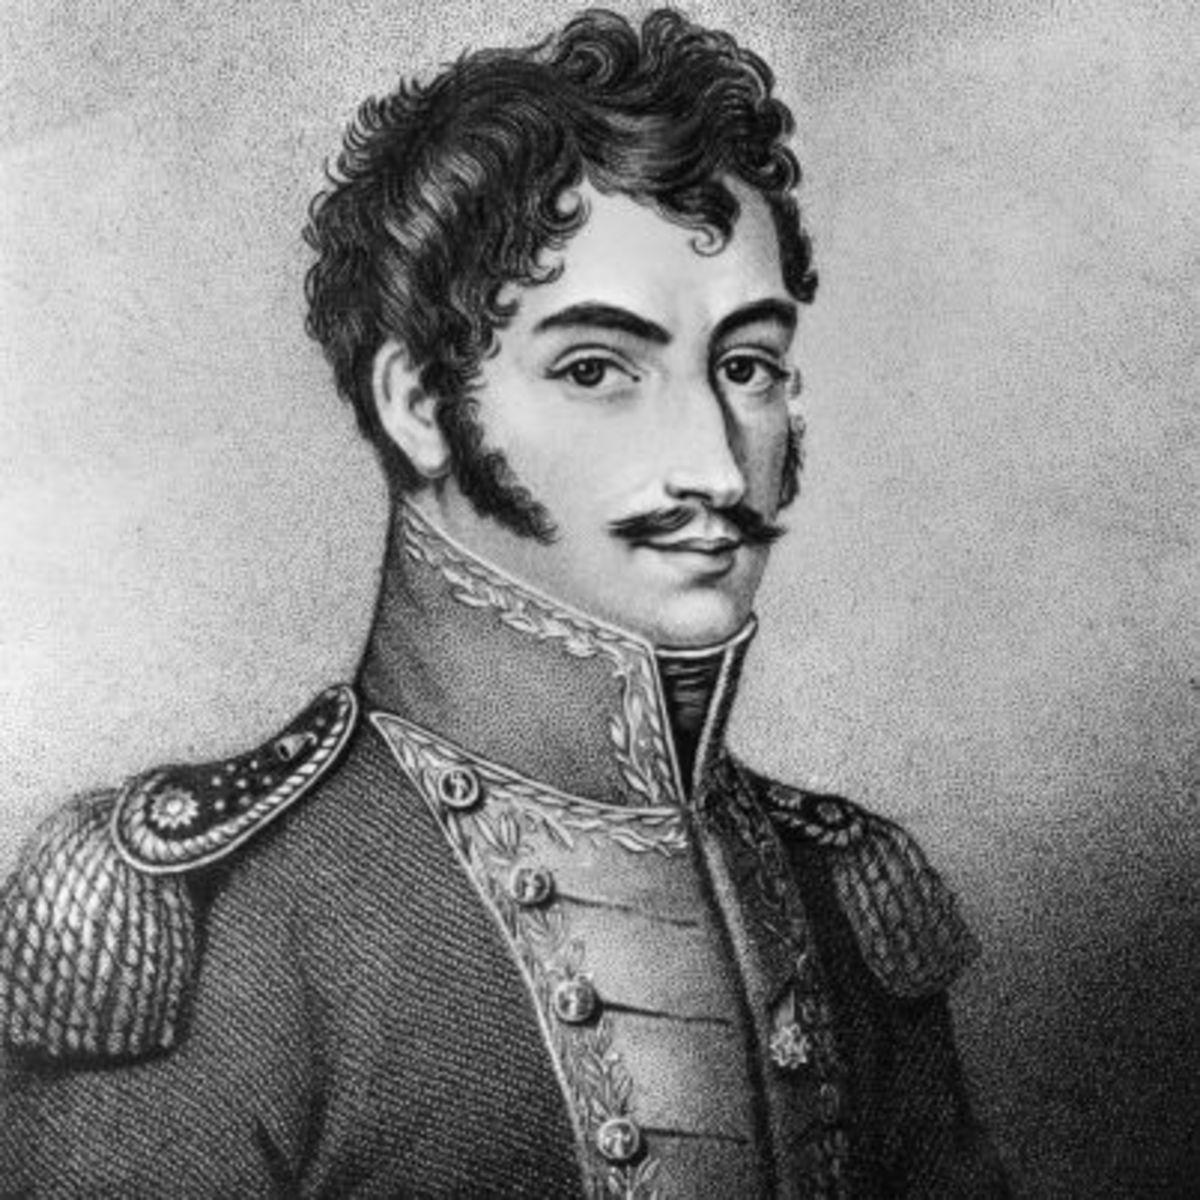 Poemas y Versos: Frases de Simon Bolivar (3)